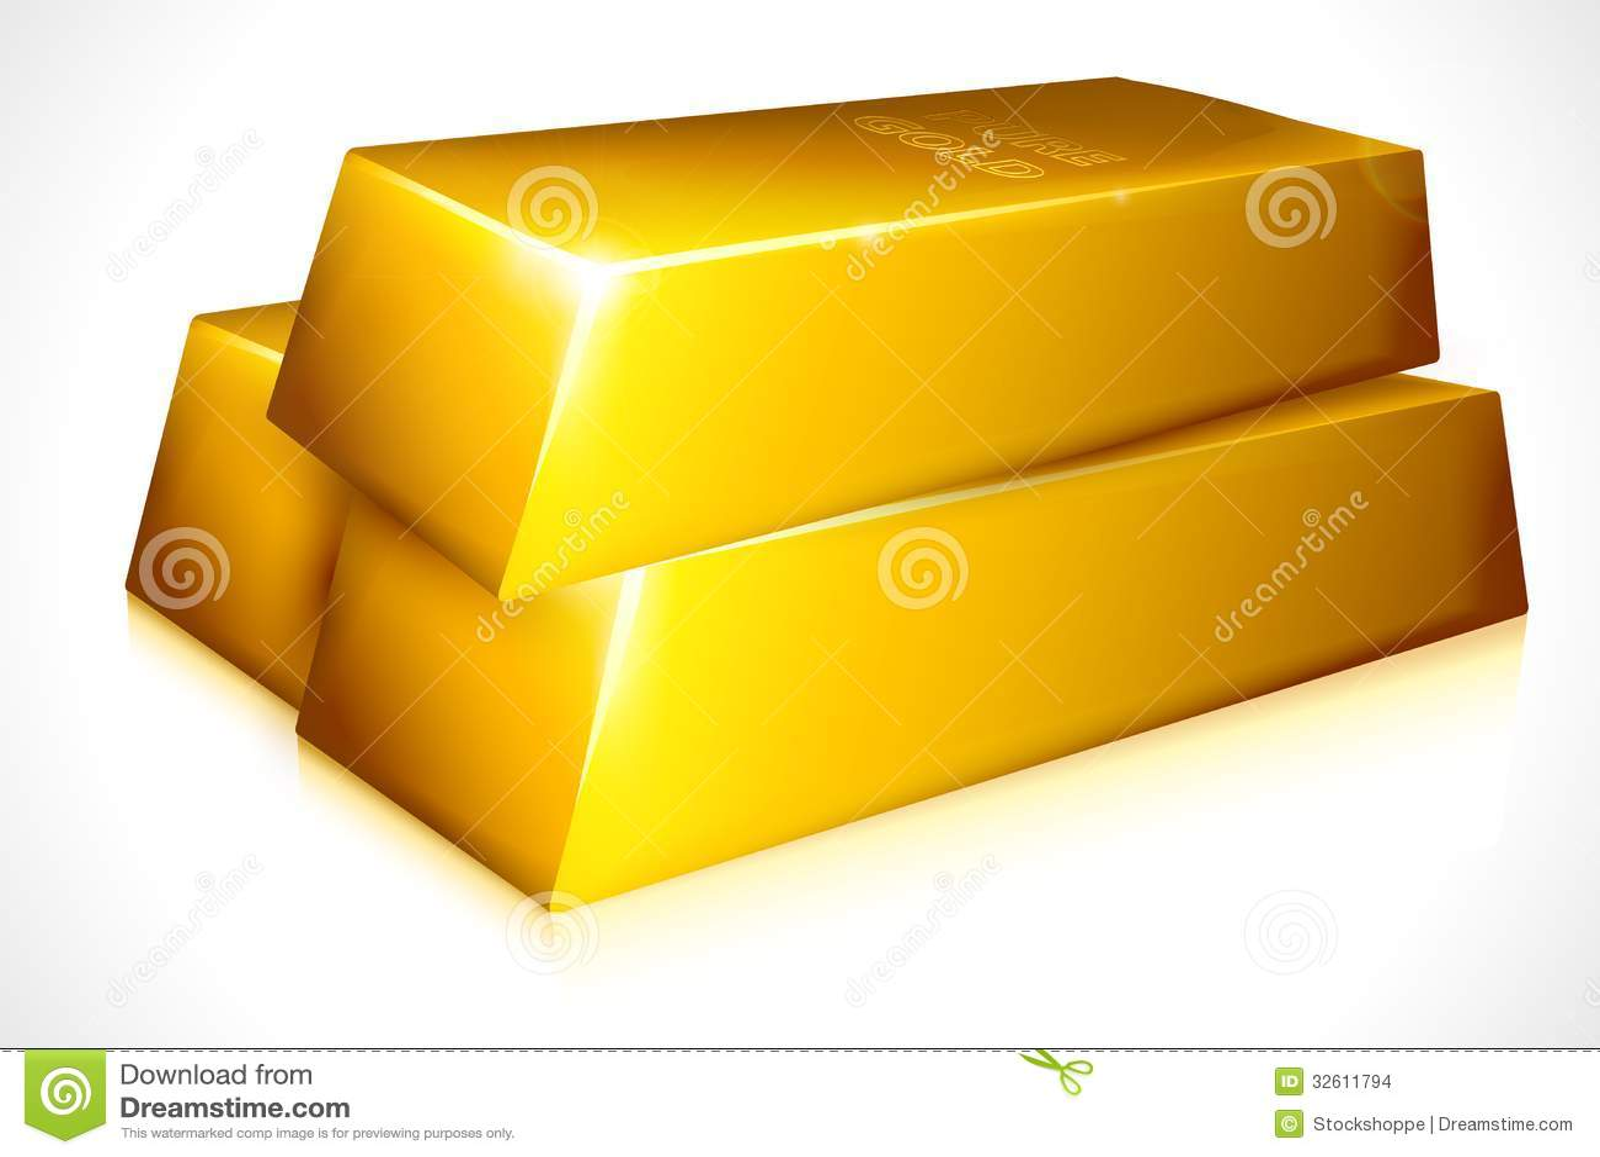 Vector illustration of gold brick against white background.